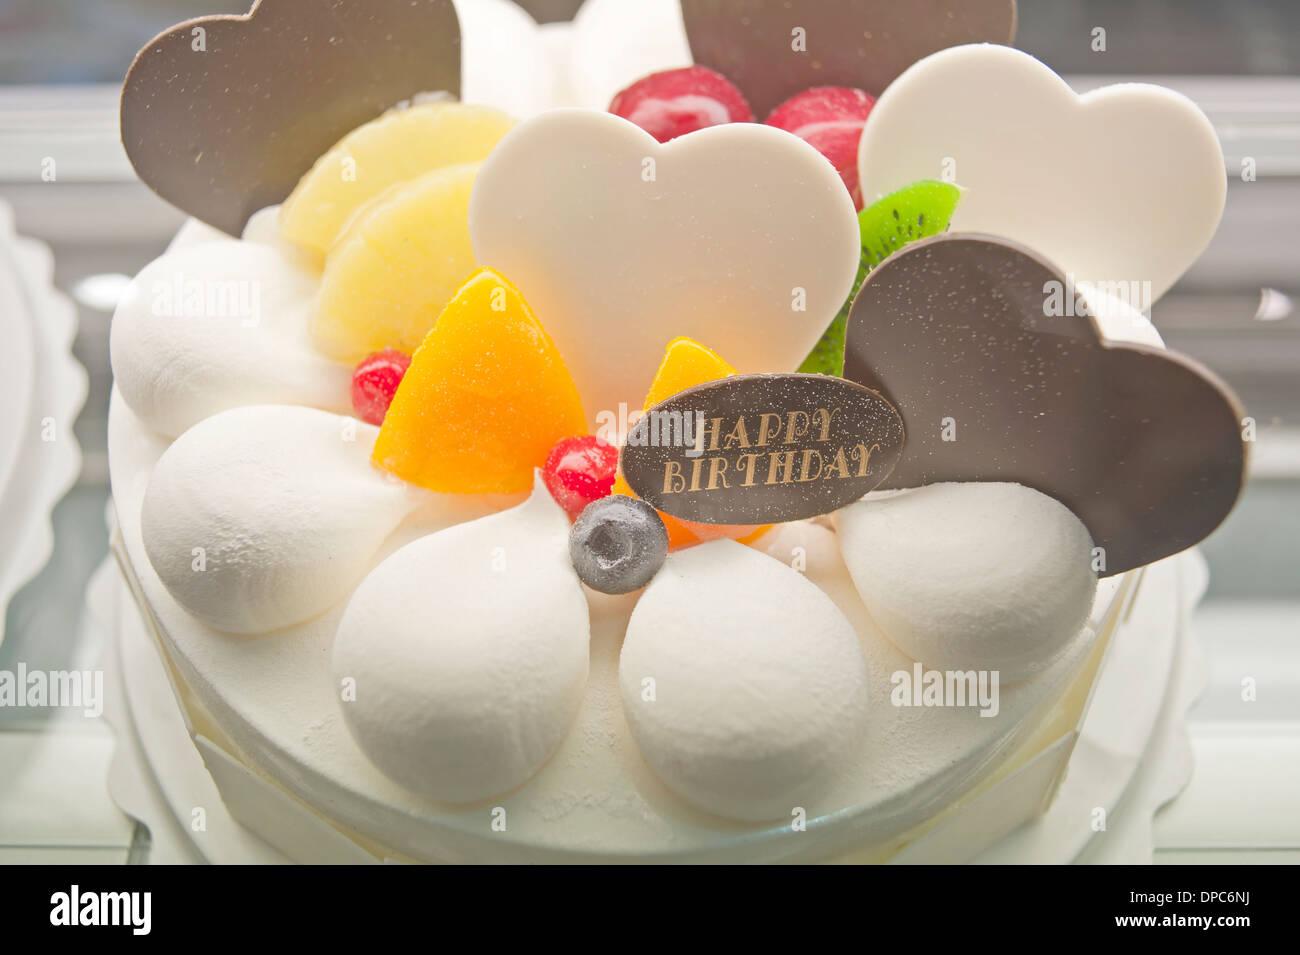 Cake Birthday Cake Dessert Food Sweets Food Cake Design Fruit Fruit